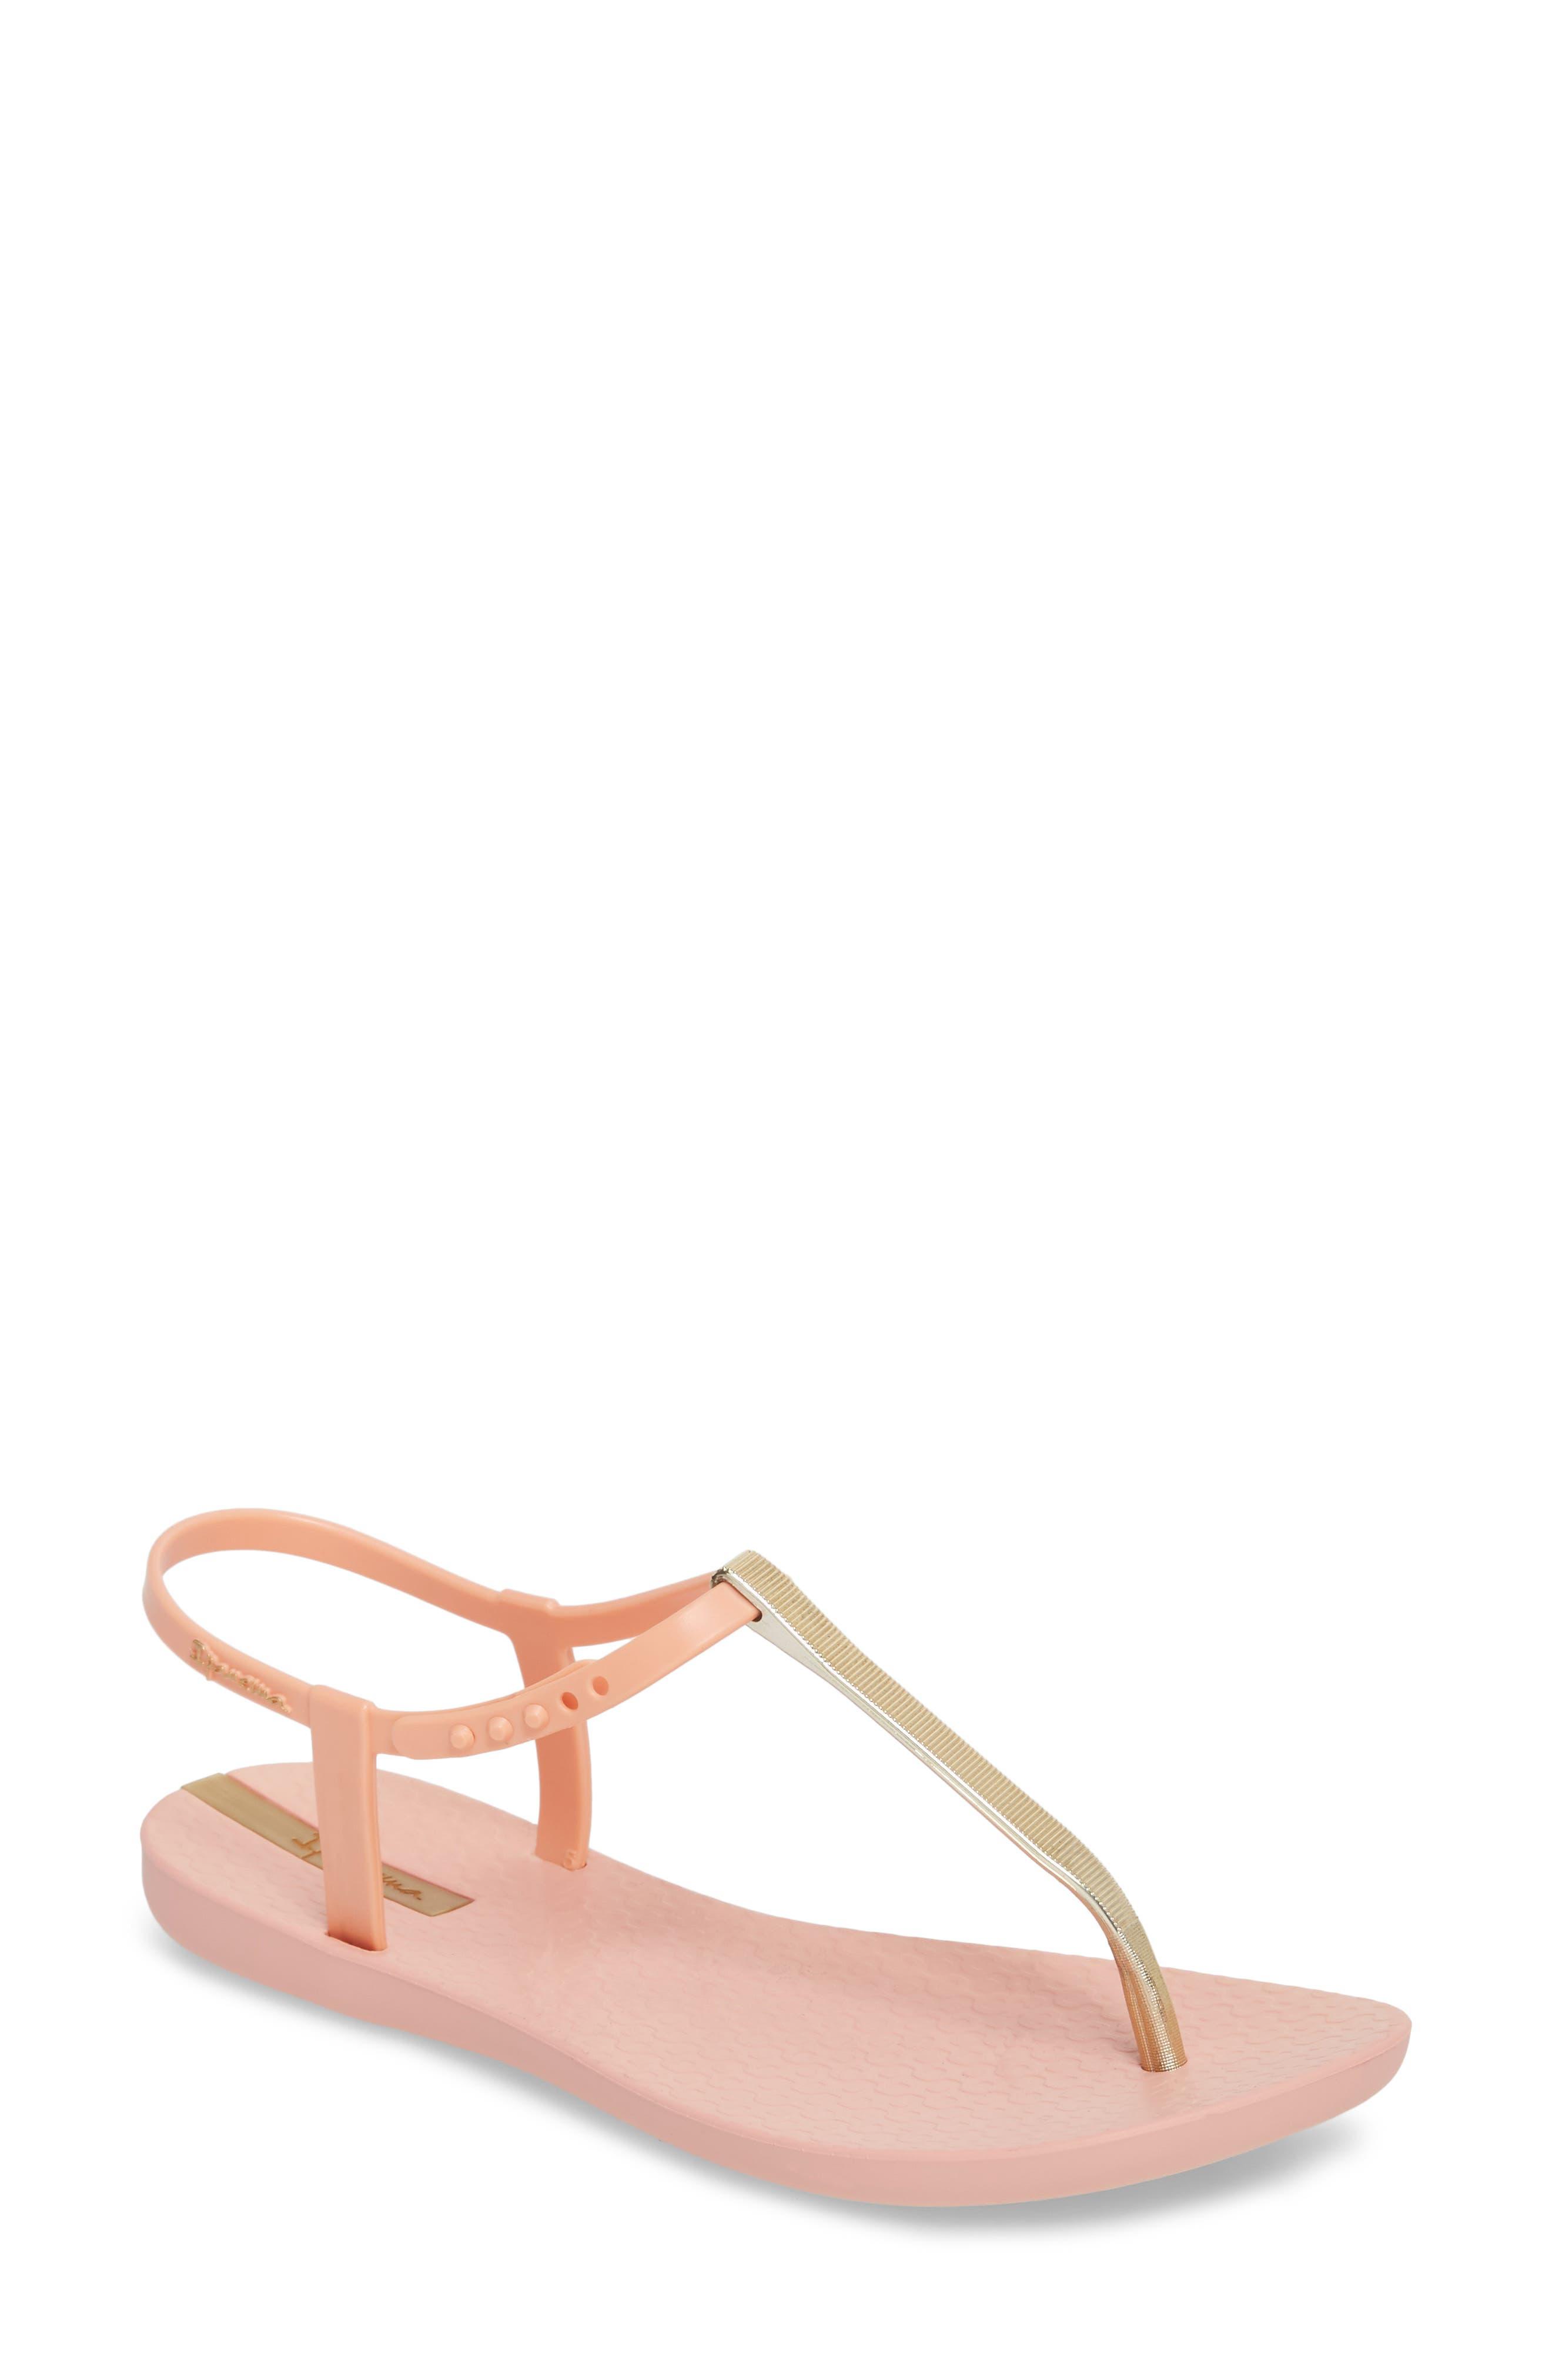 Bandeau Sandal,                         Main,                         color, Pink/ Gold